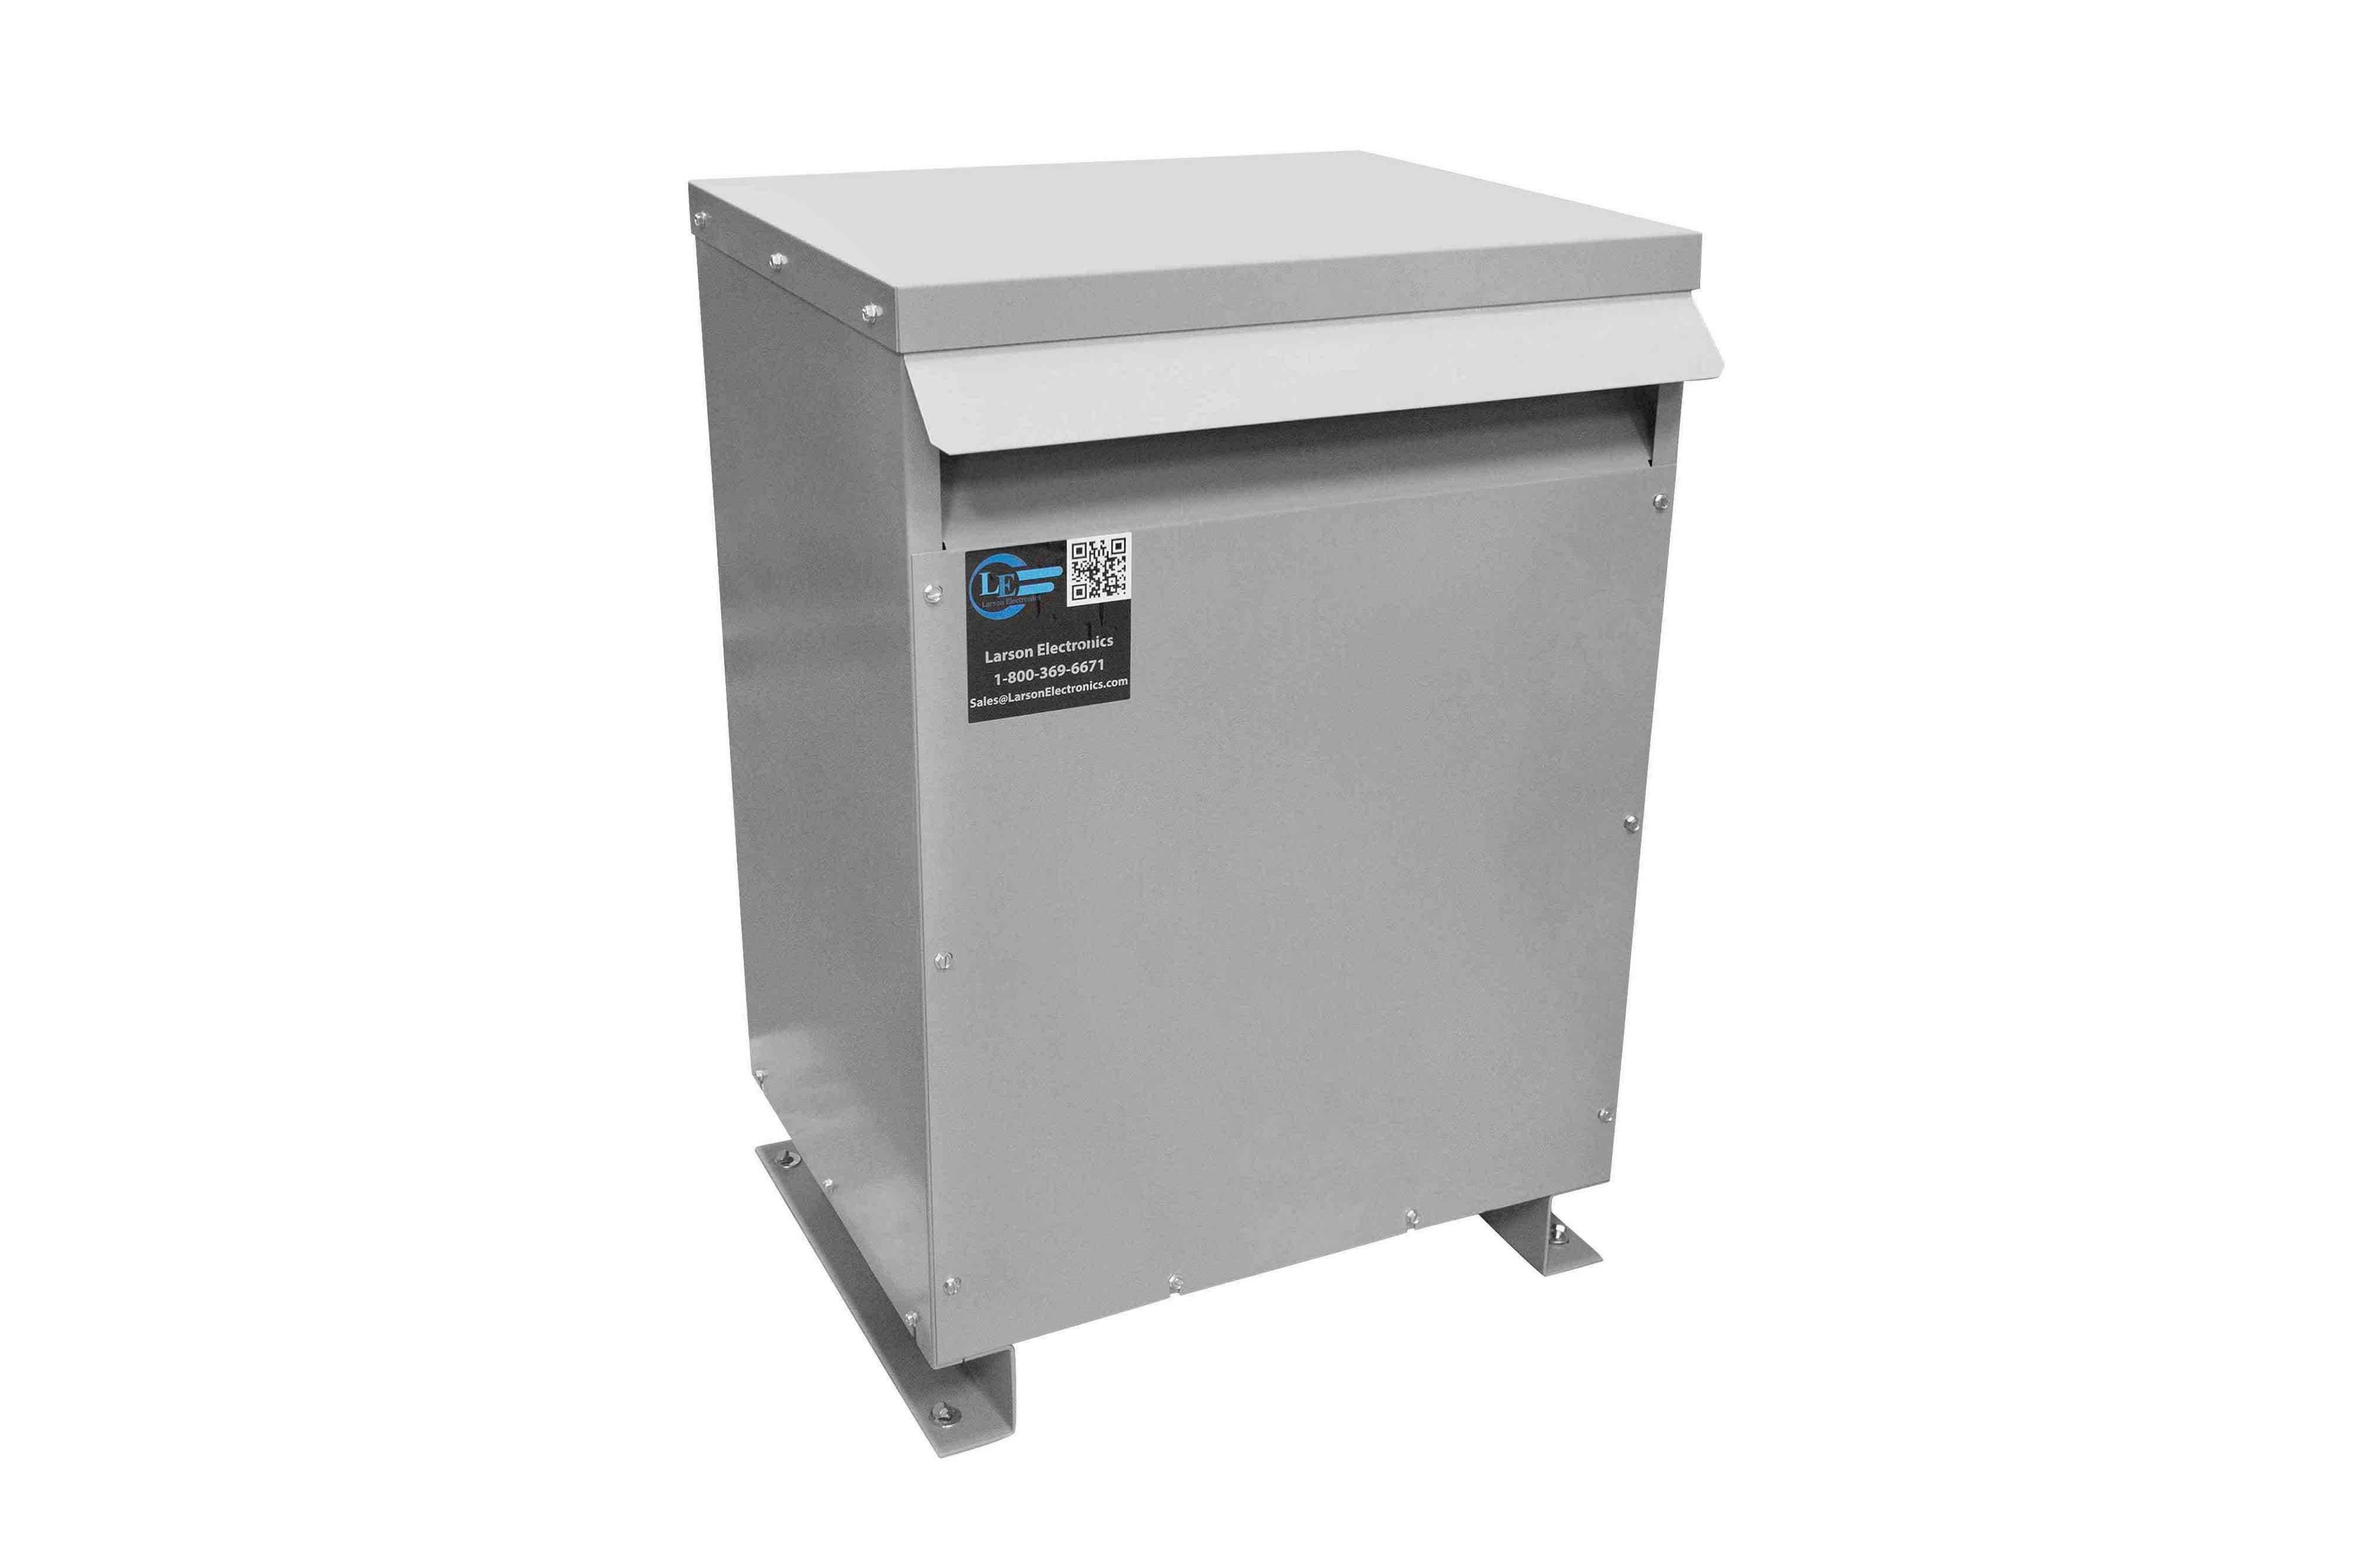 100 kVA 3PH Isolation Transformer, 208V Wye Primary, 380V Delta Secondary, N3R, Ventilated, 60 Hz